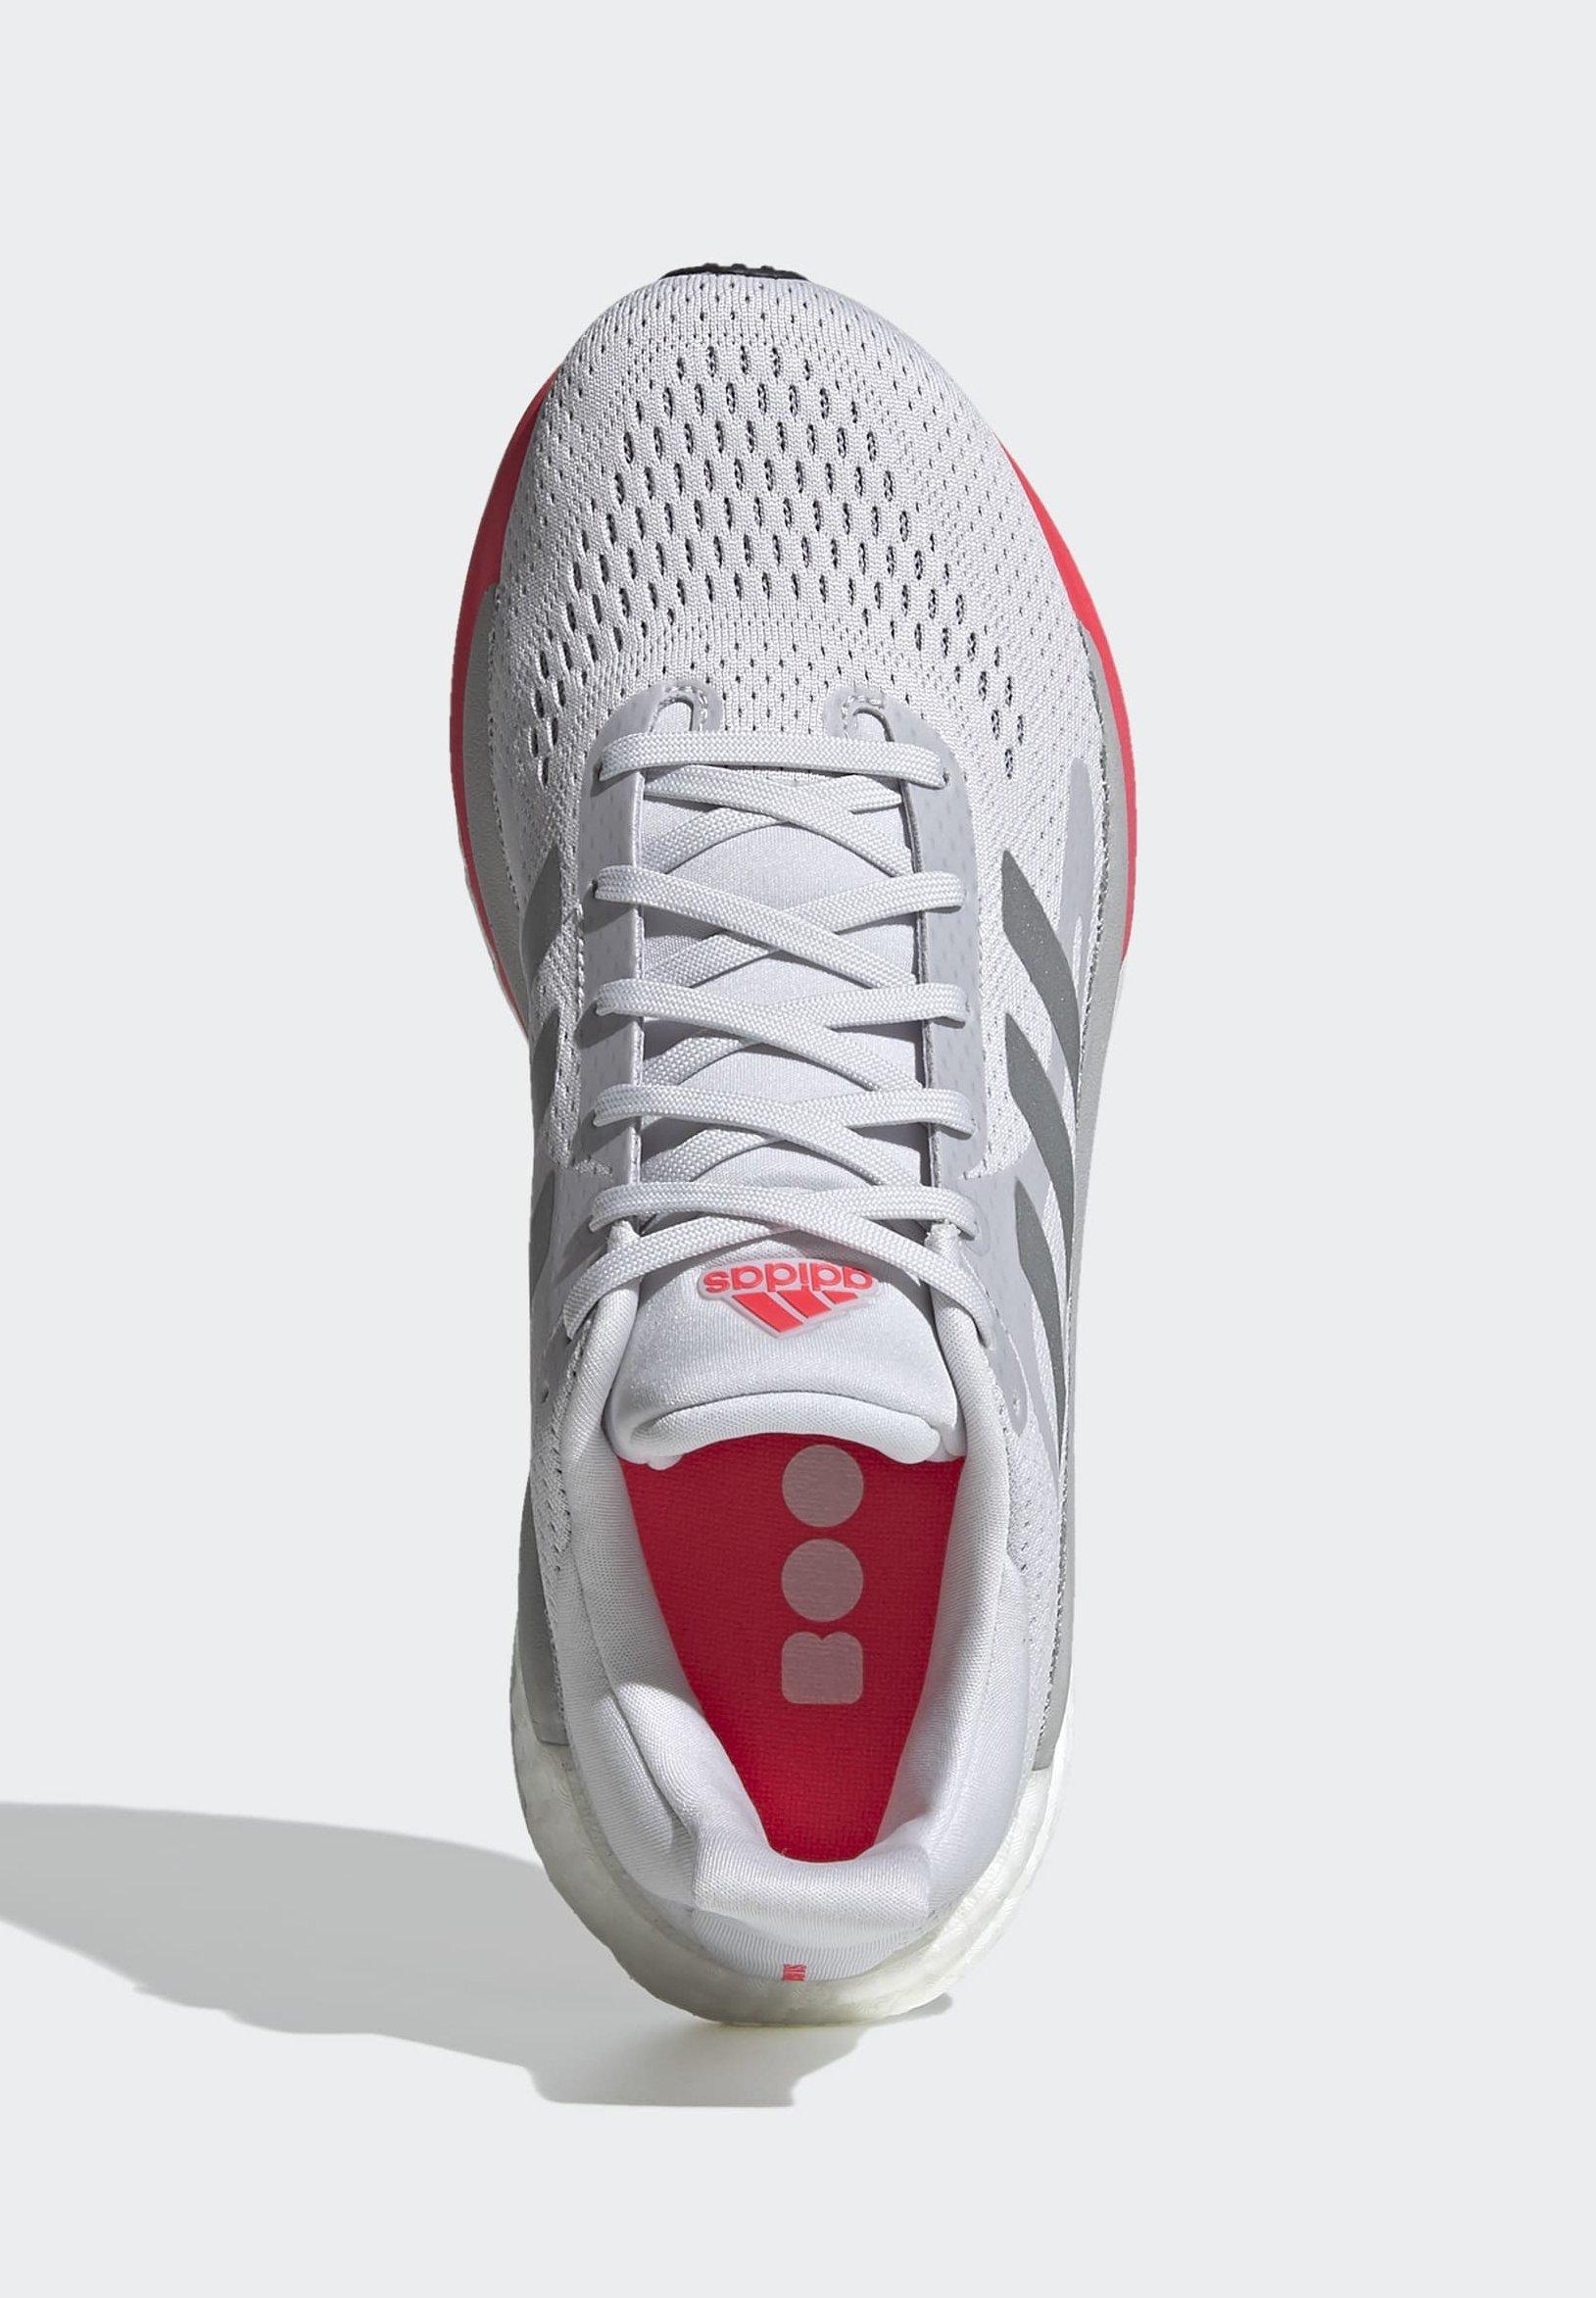 Adidas Performance Solarglide 3 Shoes - Hardloopschoenen Neutraal Grey Goedkope Schoenen